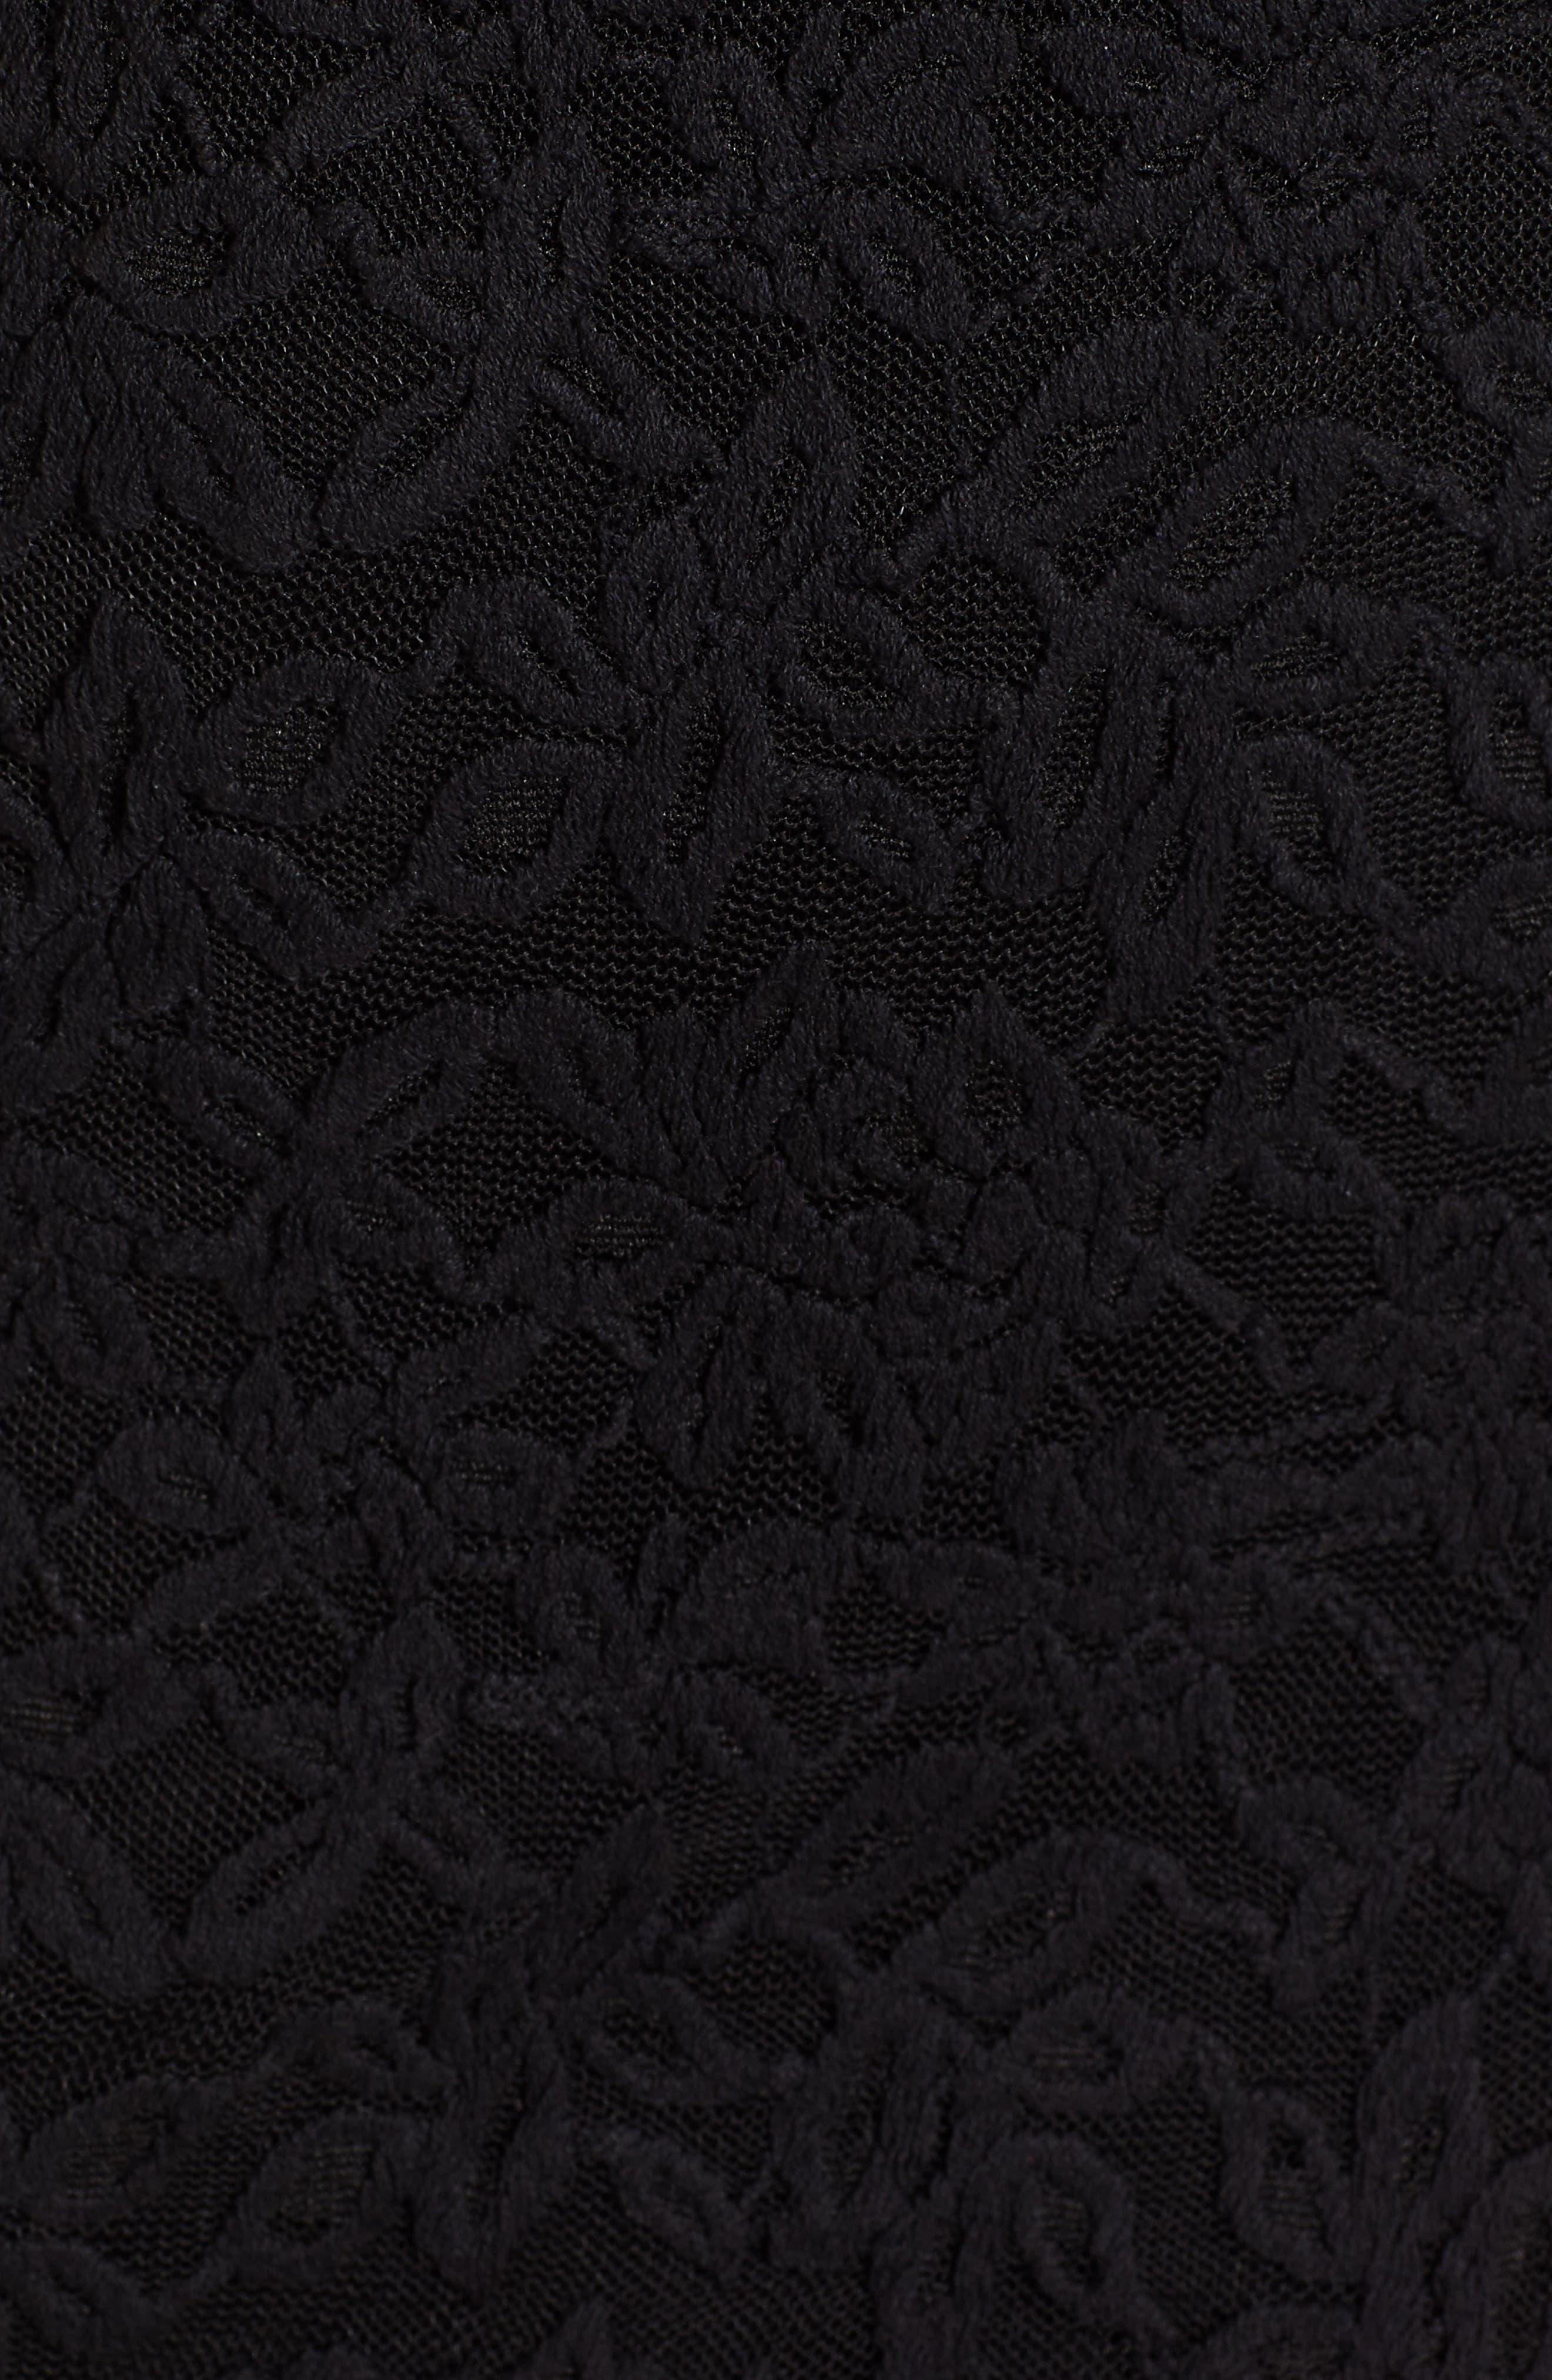 ROSEMUNDE, Delicia V-Neck Dress, Alternate thumbnail 6, color, BLACK